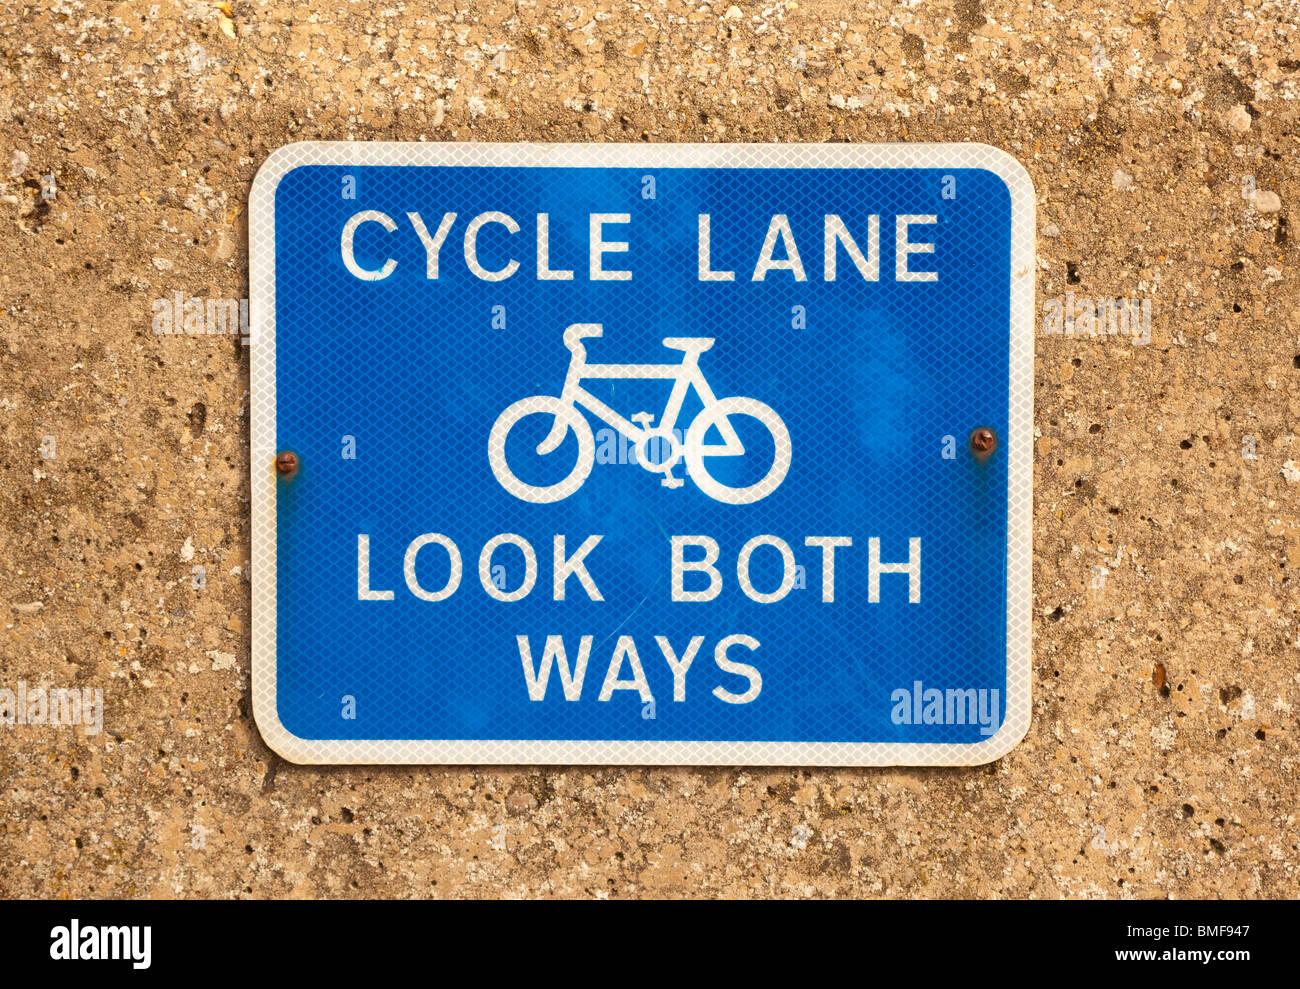 cycle lane sign uk - Stock Image